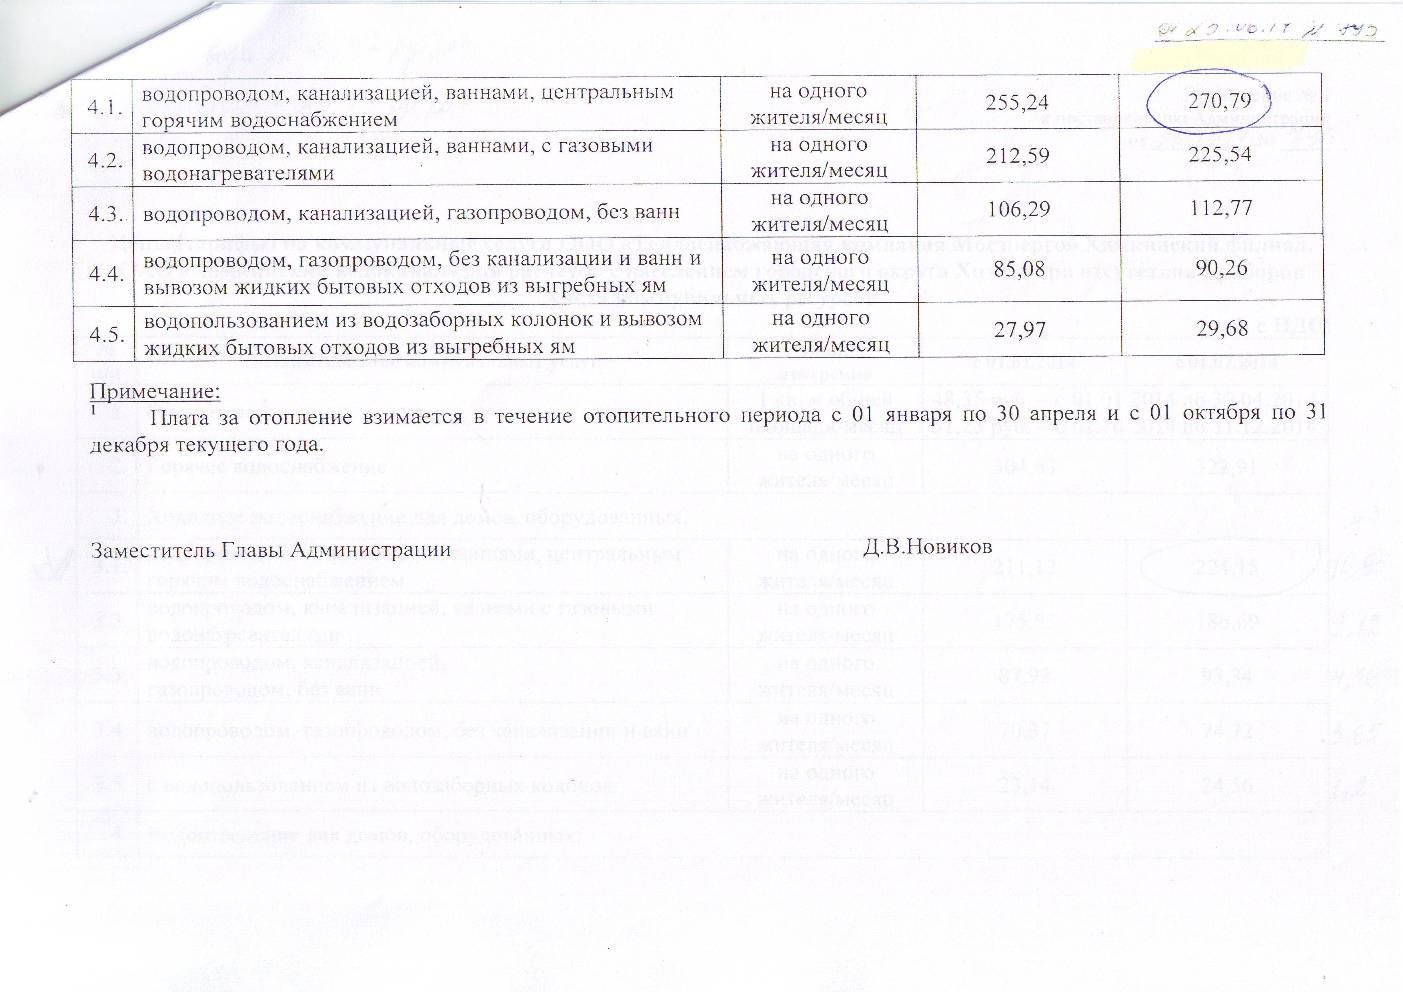 Тарифы на воду Новиков 2